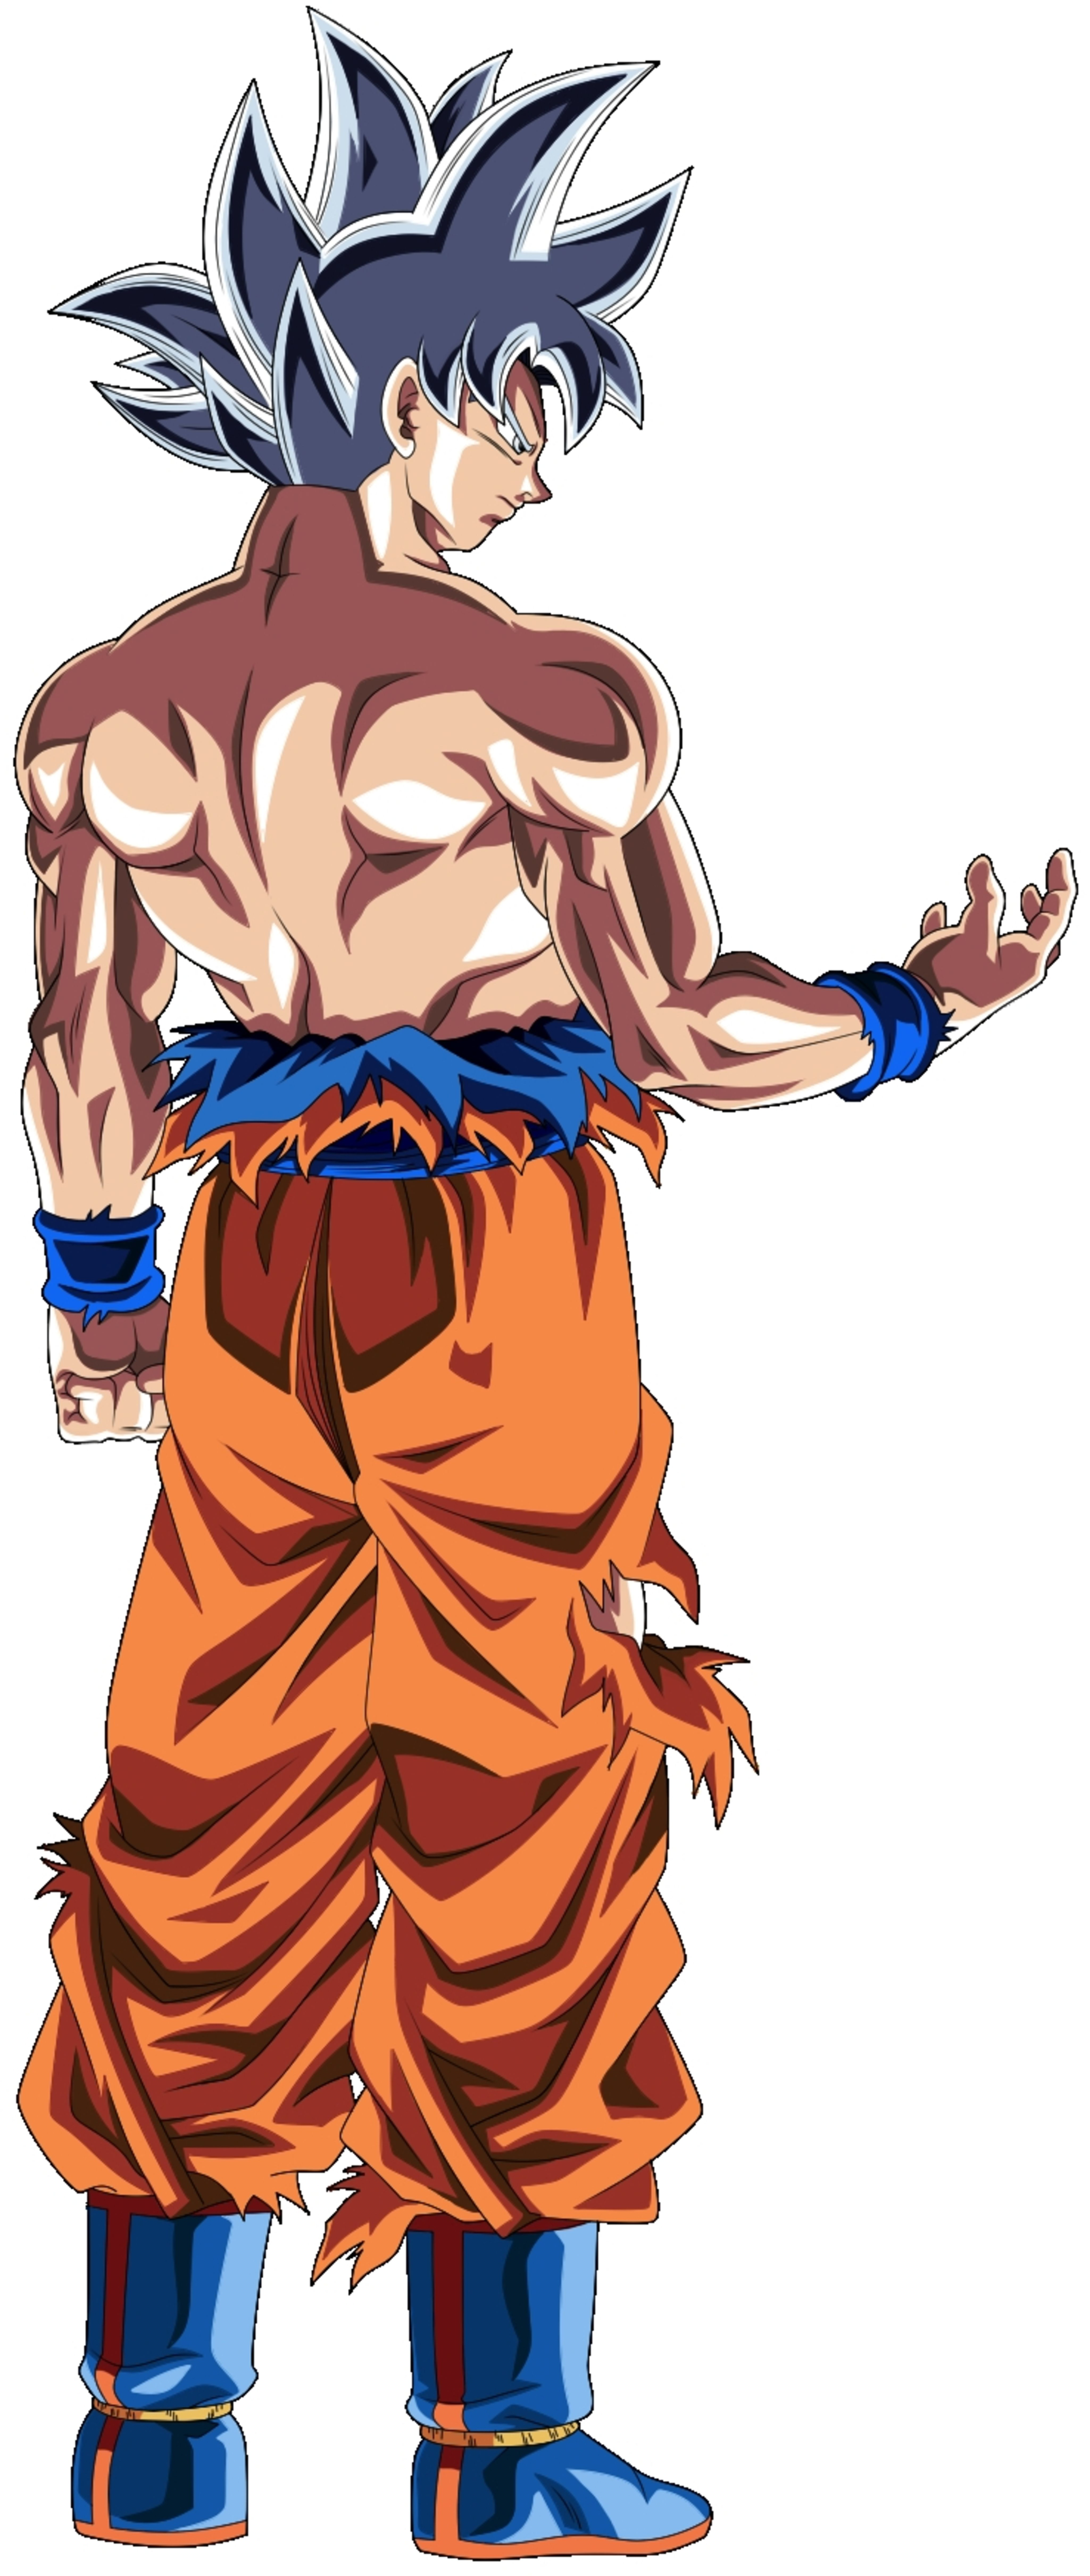 Goku Ultra Instinto Dominado Universo 7 Anime Dragon Ball Super Dragon Ball Super Goku Anime Dragon Ball